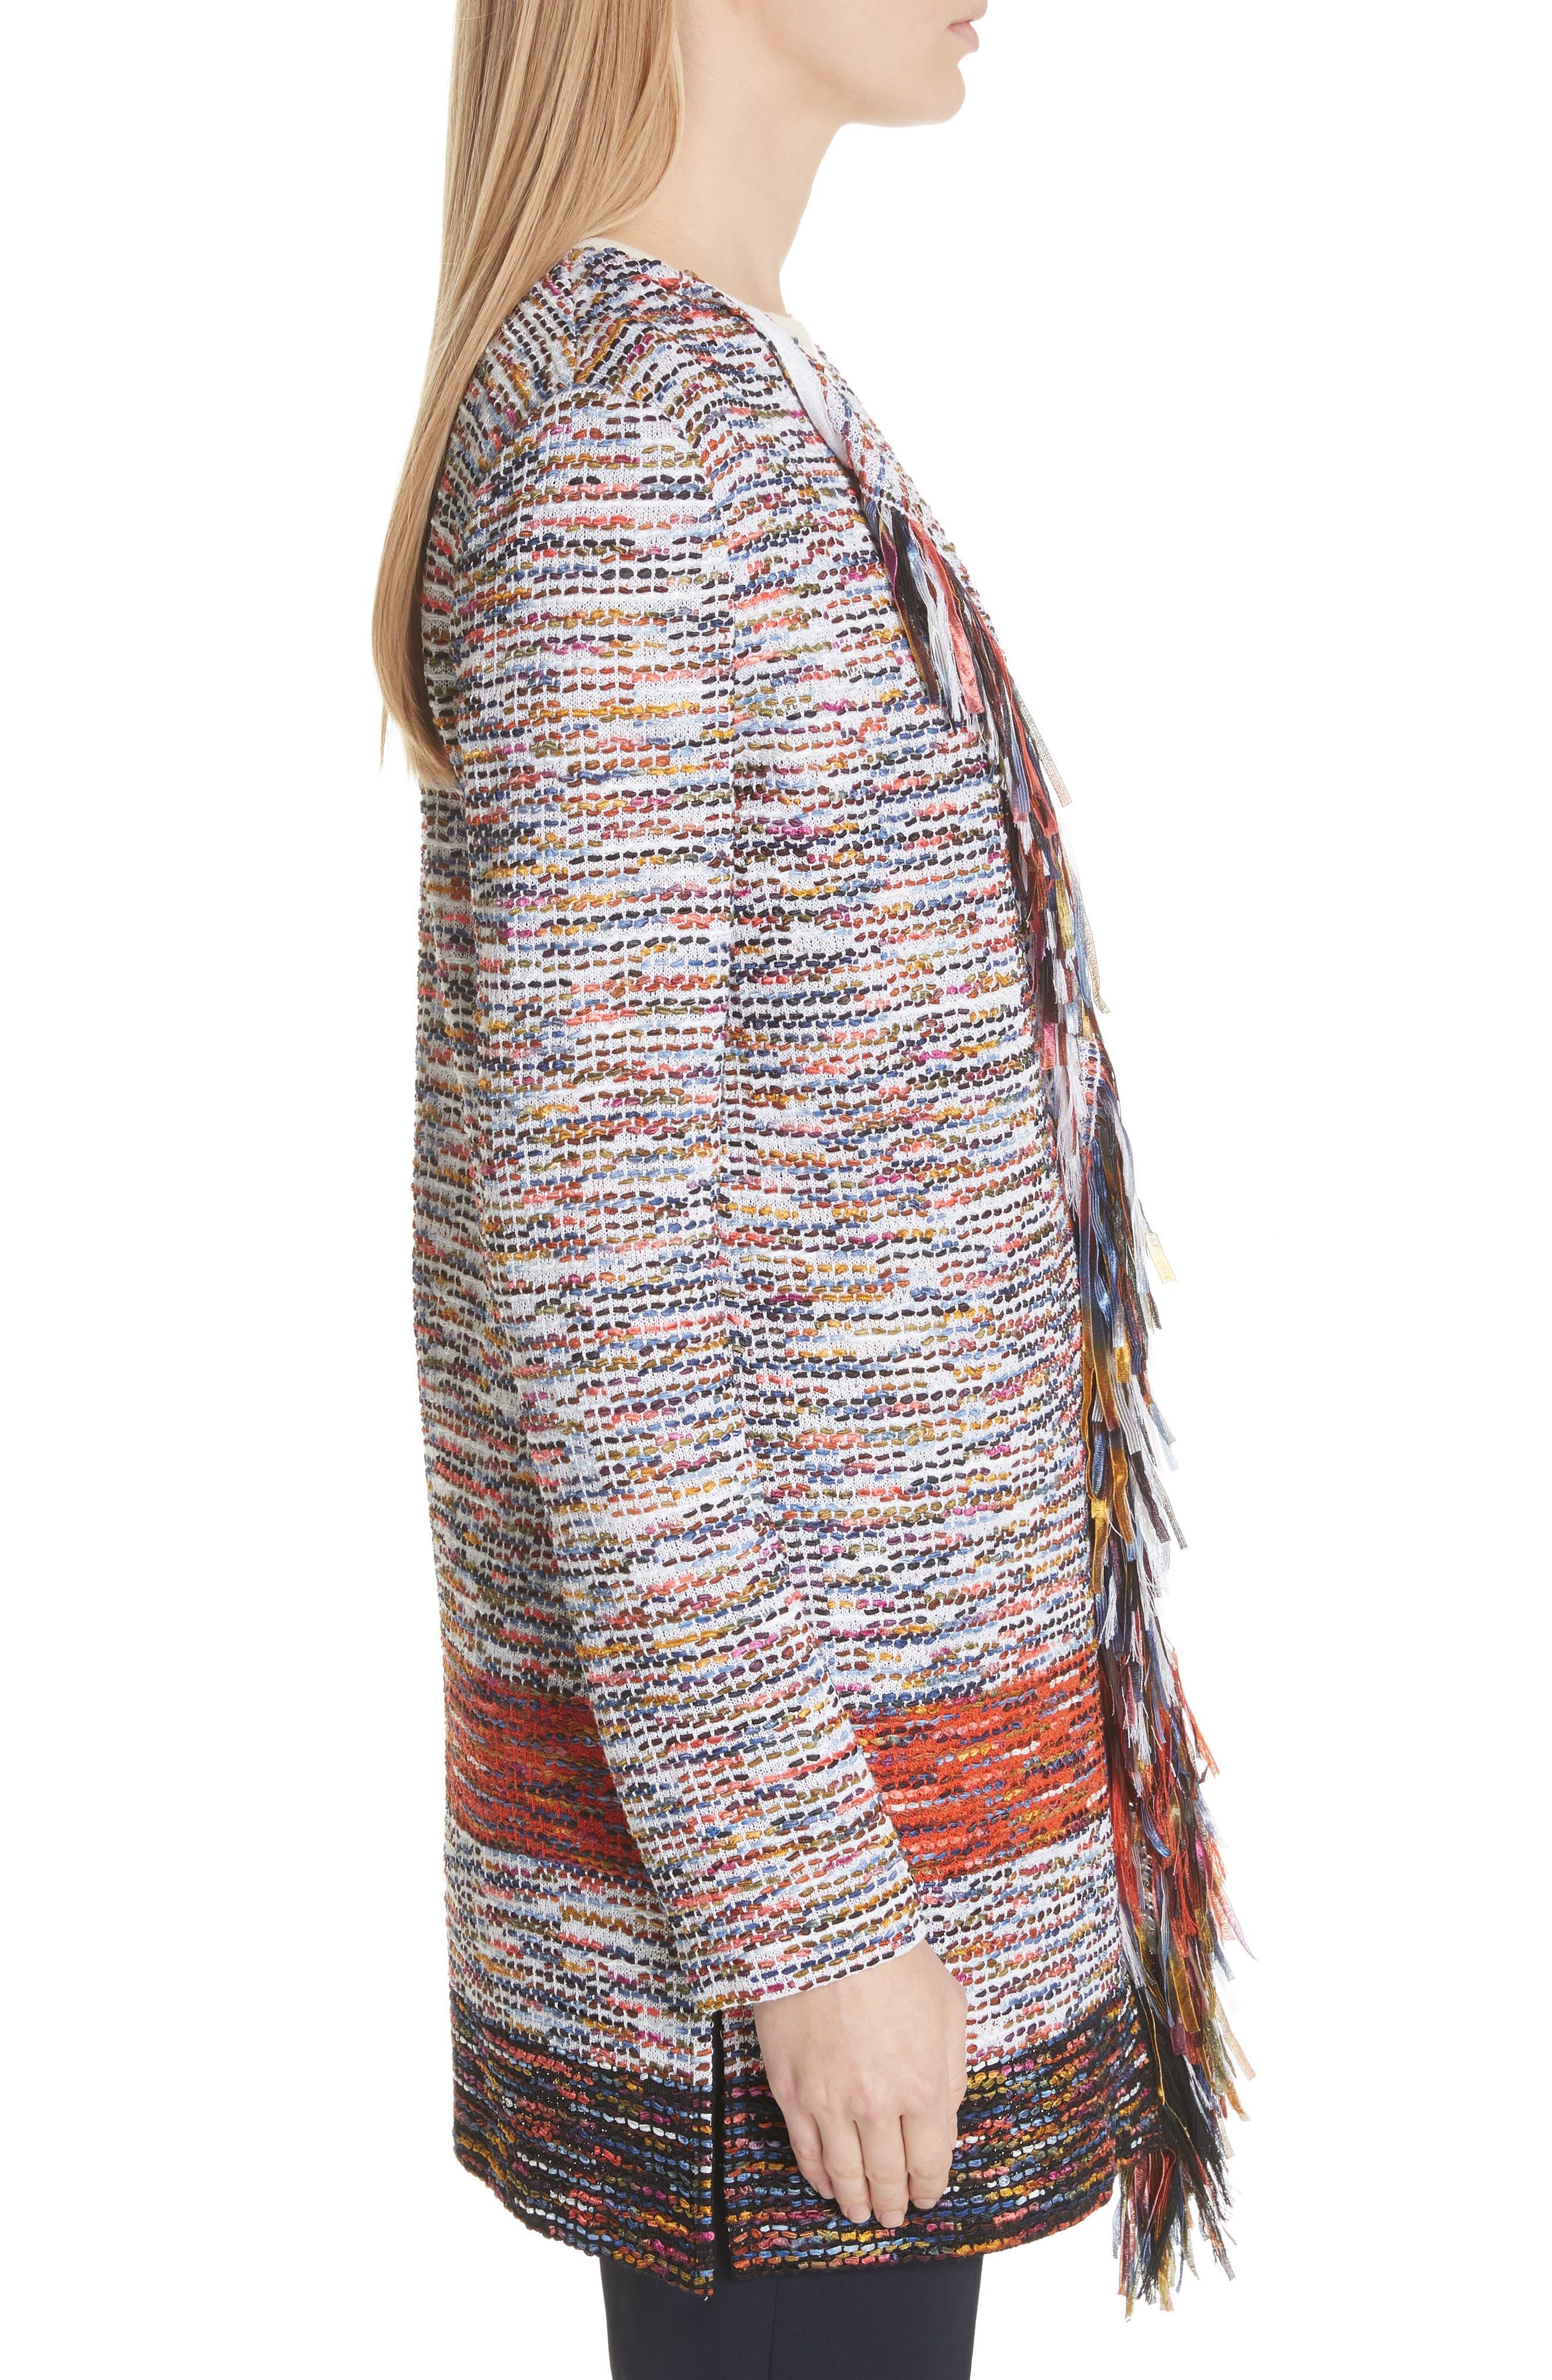 Vertical Fringe Multi Tweed Knit Waterfall Cardigan,                             Alternate thumbnail 3, color,                             SIENNA MULTI